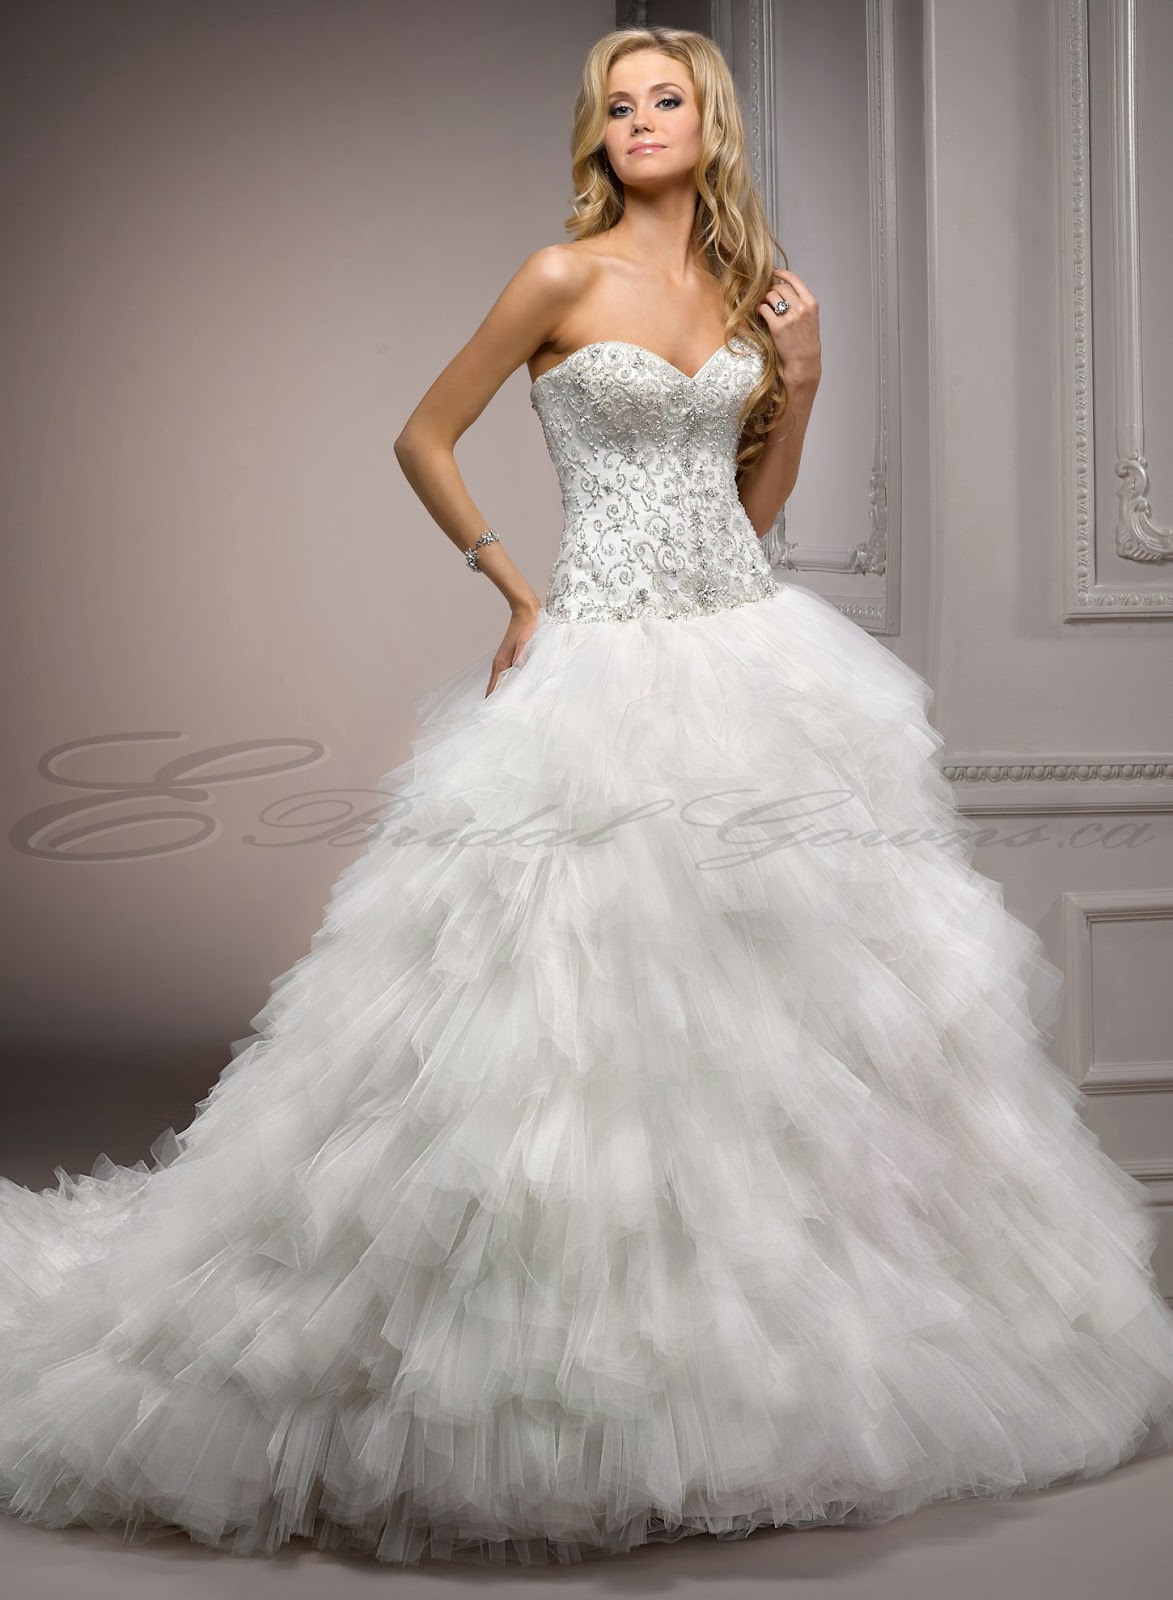 wedding dresses cheap wedding dresses cheap wedding dresses cheap